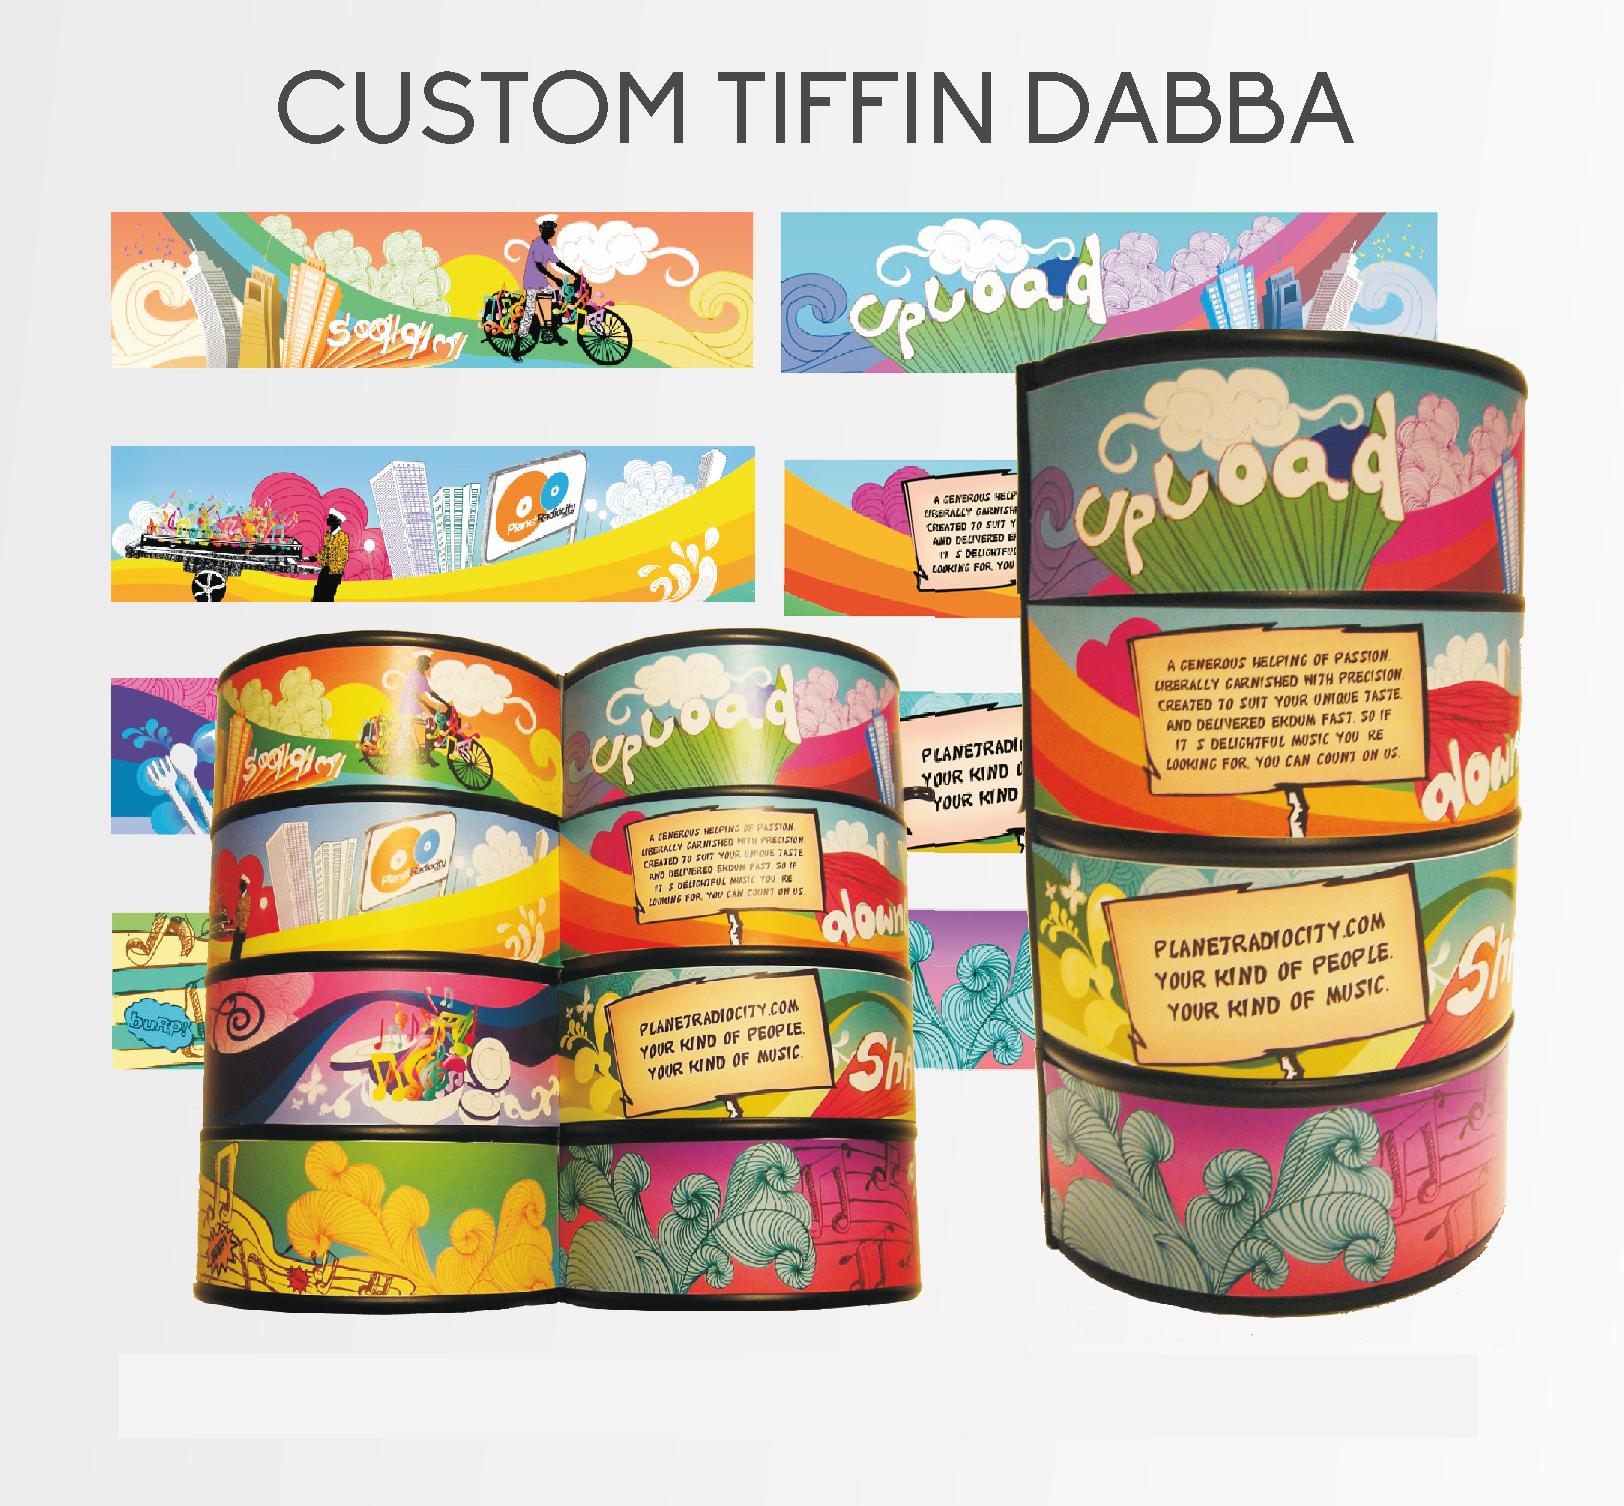 Customized Tiffin Dabba CD Case graphic designs on 'dabbawalla' concept for Radio City 91 FM, a leading Radio Channel